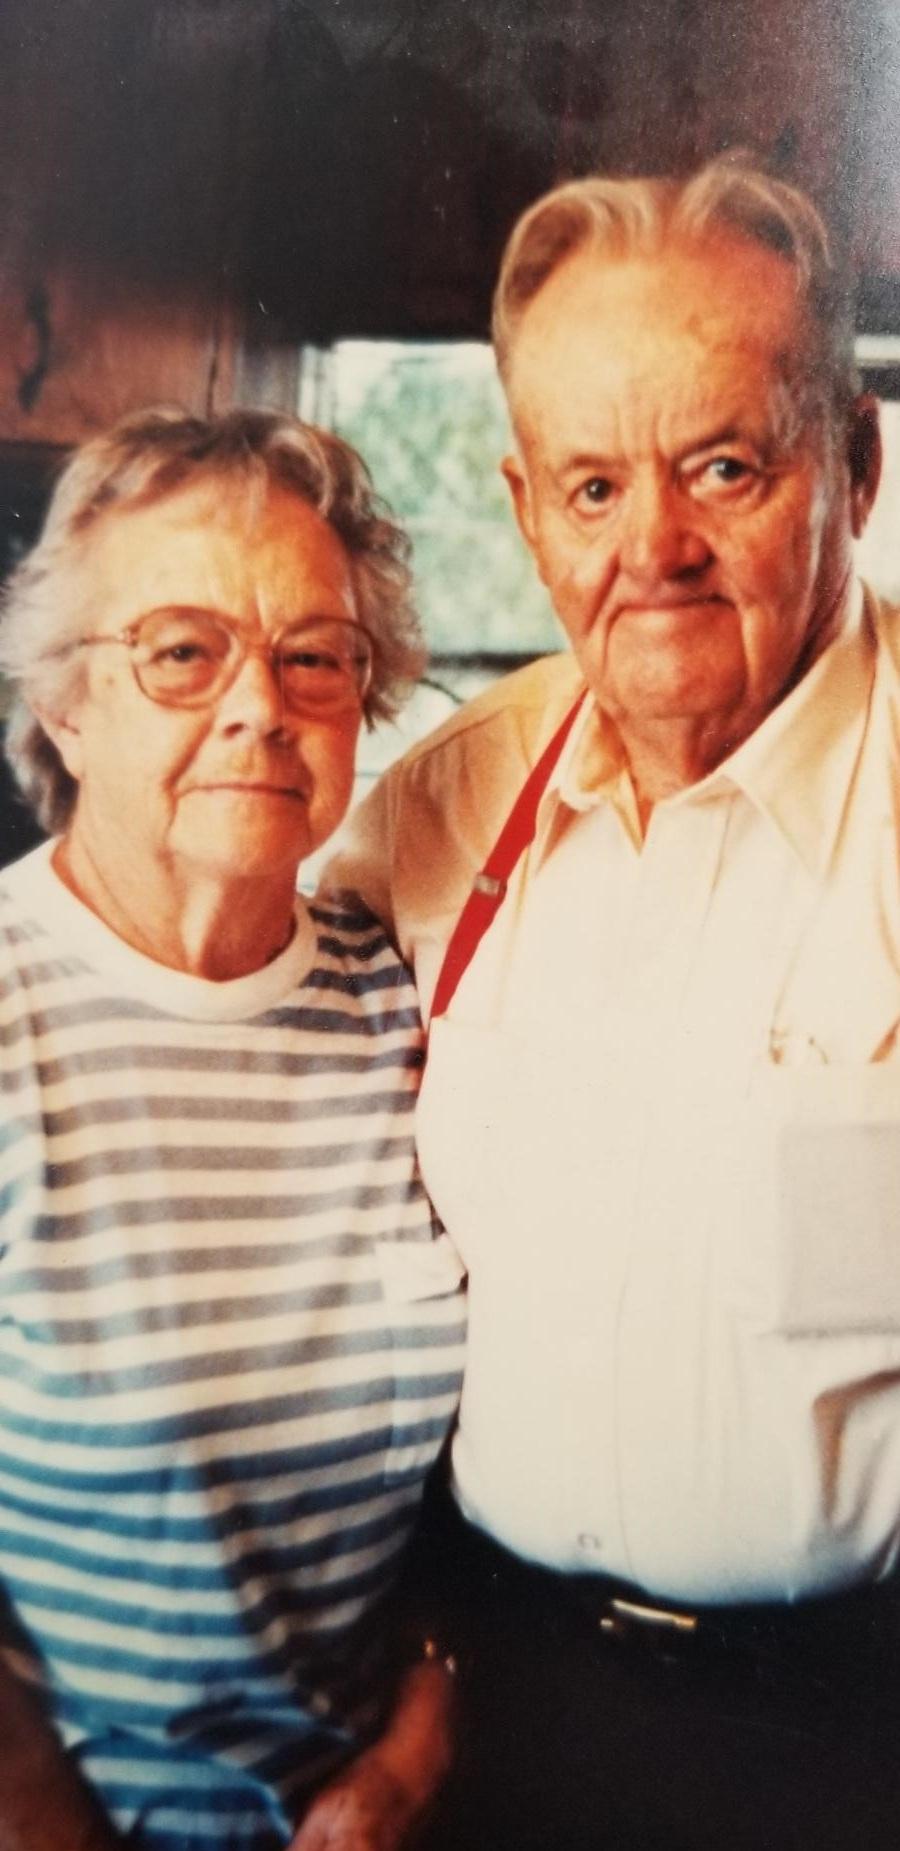 My Grandparents, Aylmer & June Ruebush. I miss them every day.